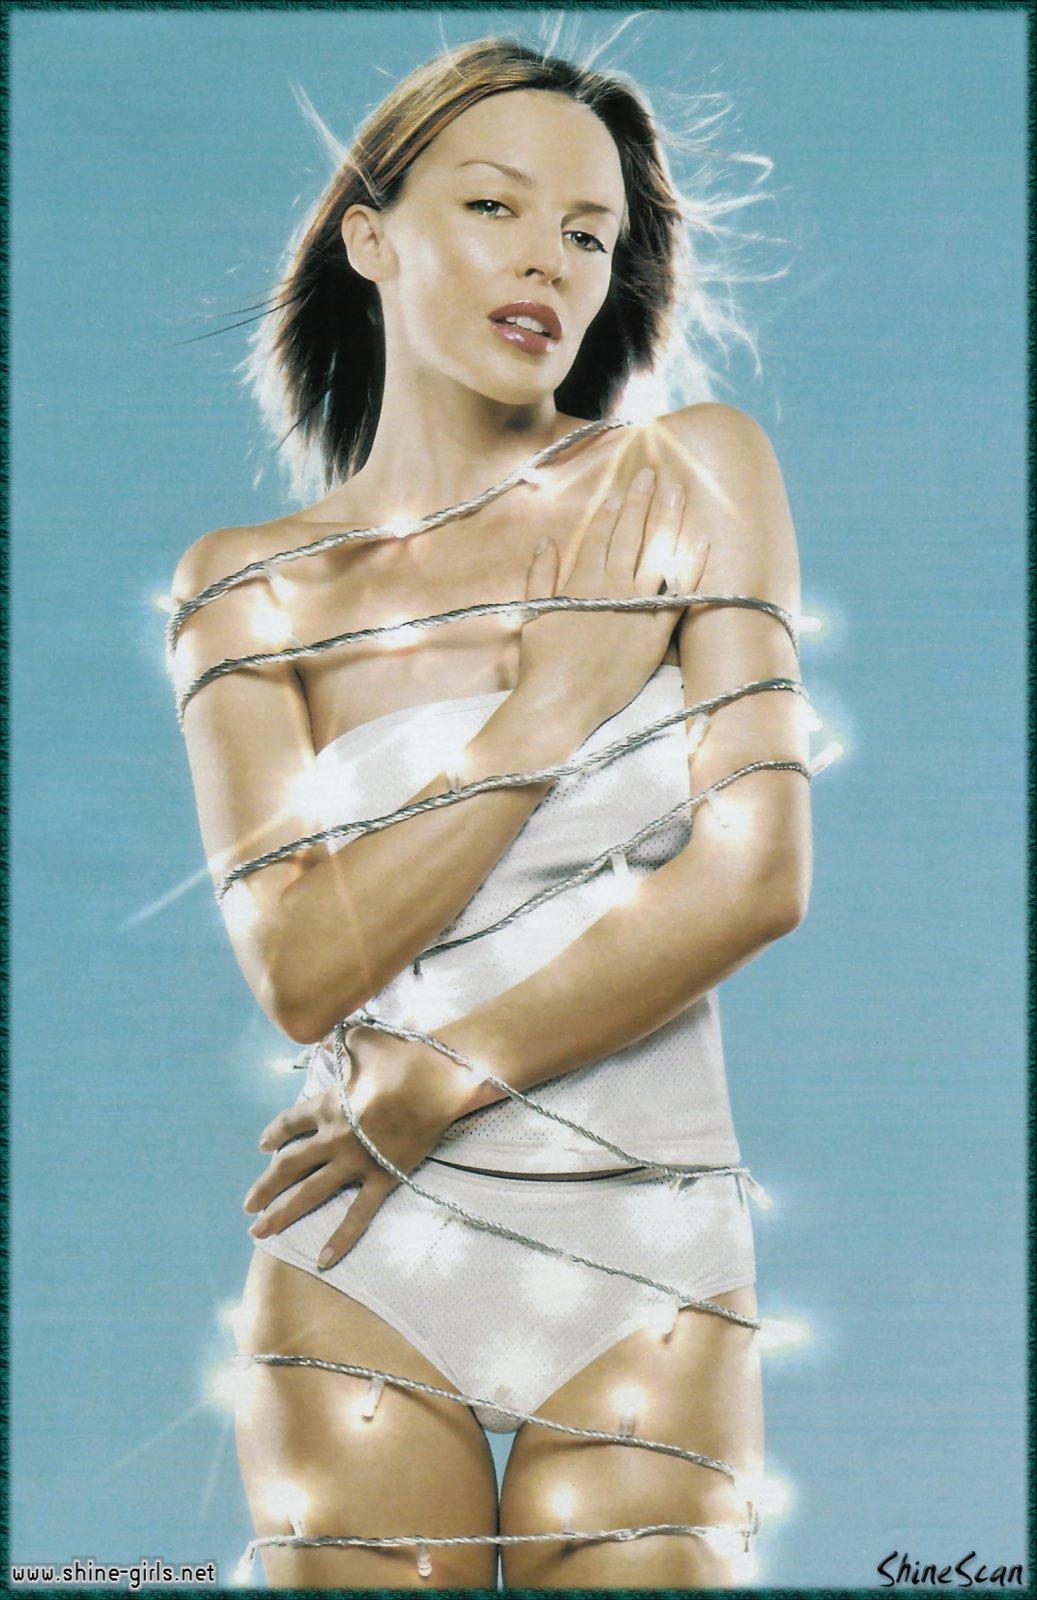 Kylie Minogue Imágenes Kylie Ann Minogue Hd Fondo De Pantalla And